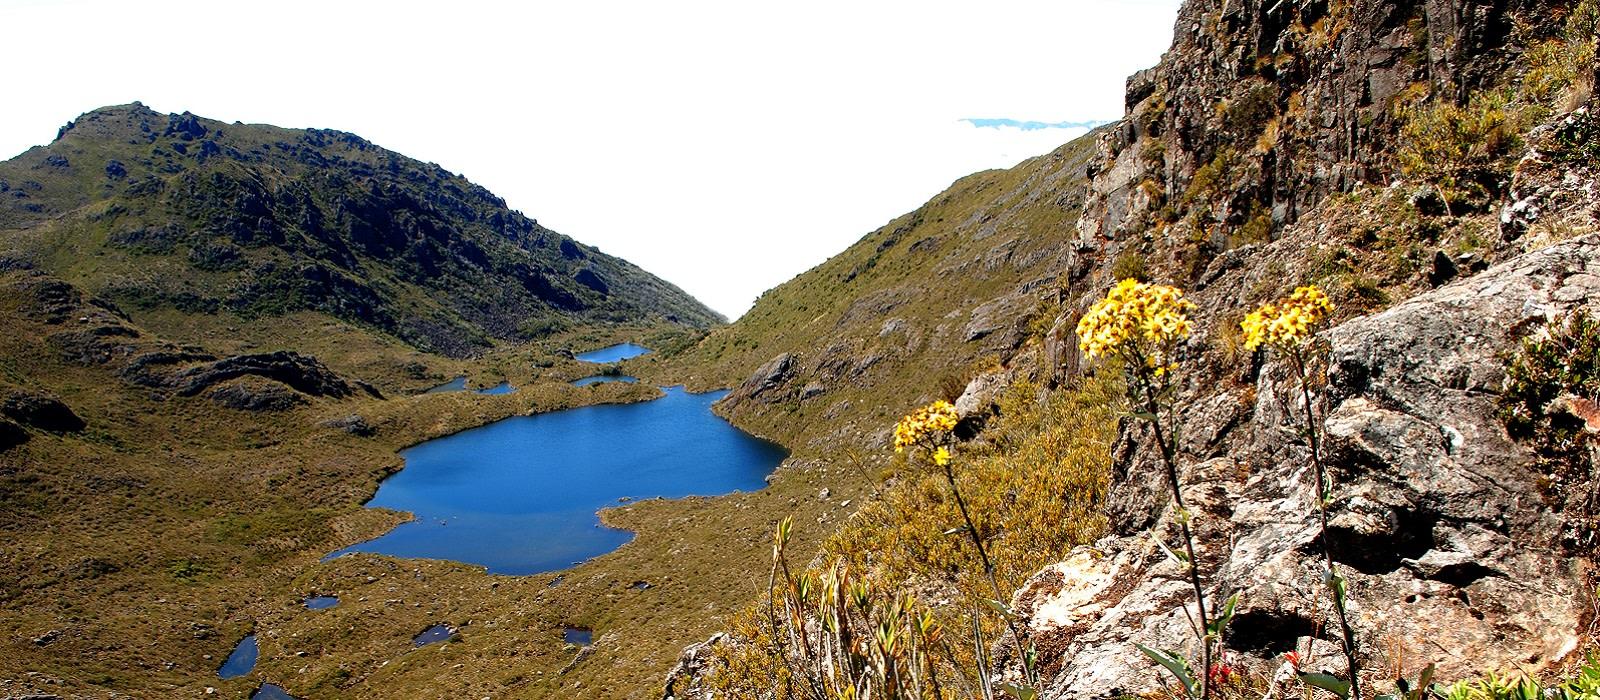 Reiseziel Perez Zeledon Costa Rica